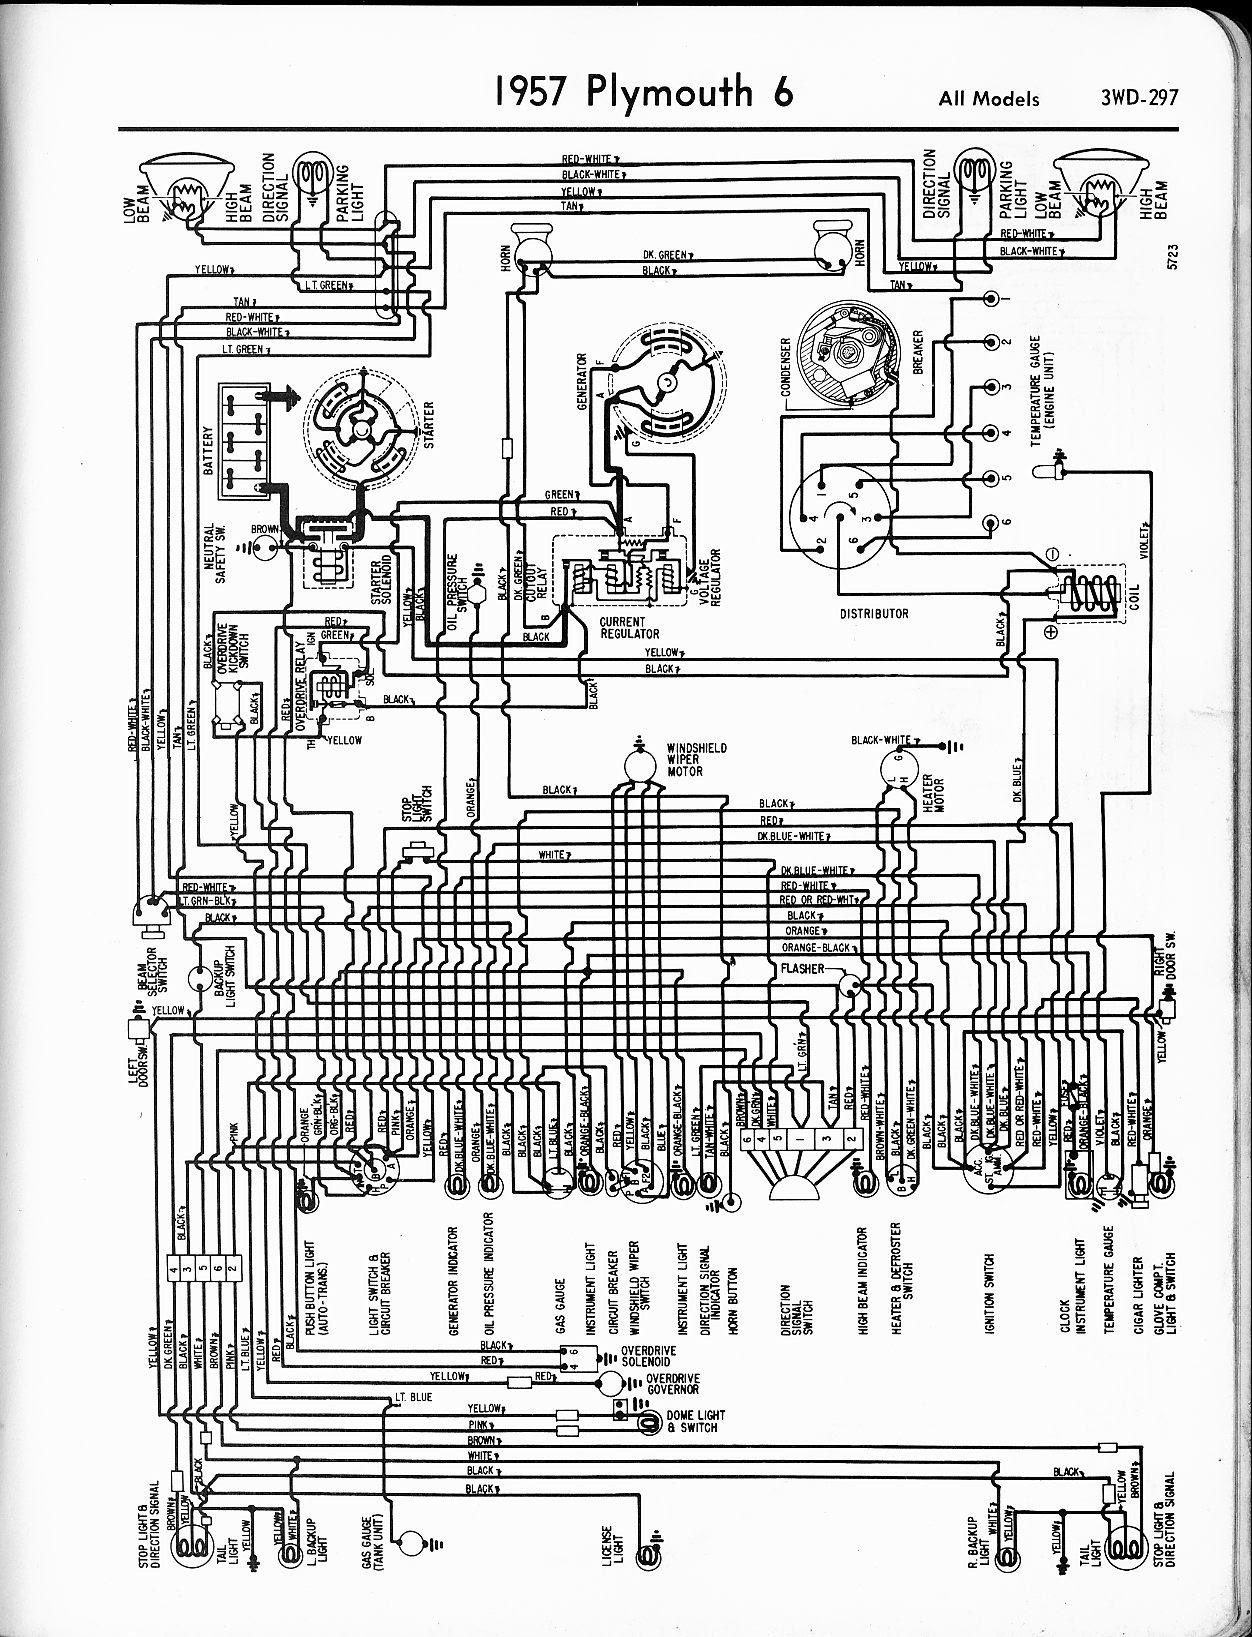 Diagram 1967 Plymouth Gtx Wiring Diagram Full Version Hd Quality Wiring Diagram Acewiring19 Newsetvlucera It